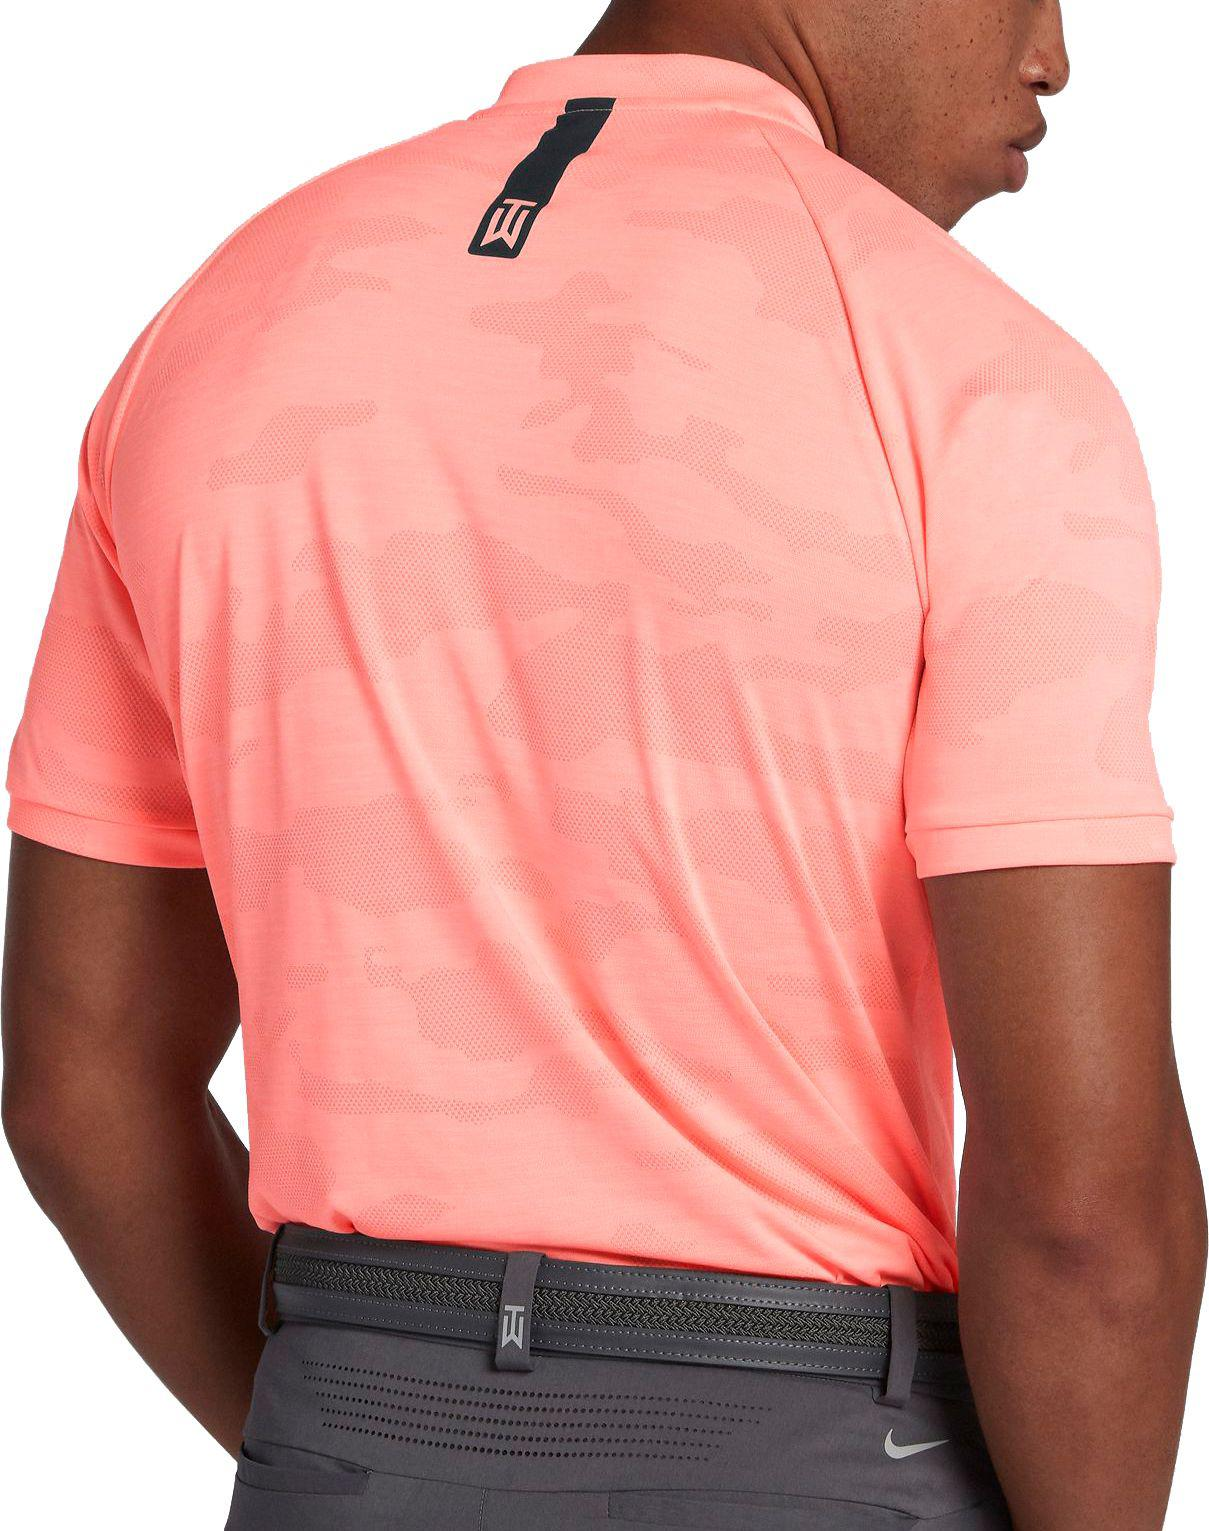 2b9efdd5 Tiger Woods Golf Shirts Uk | Top Mode Depot